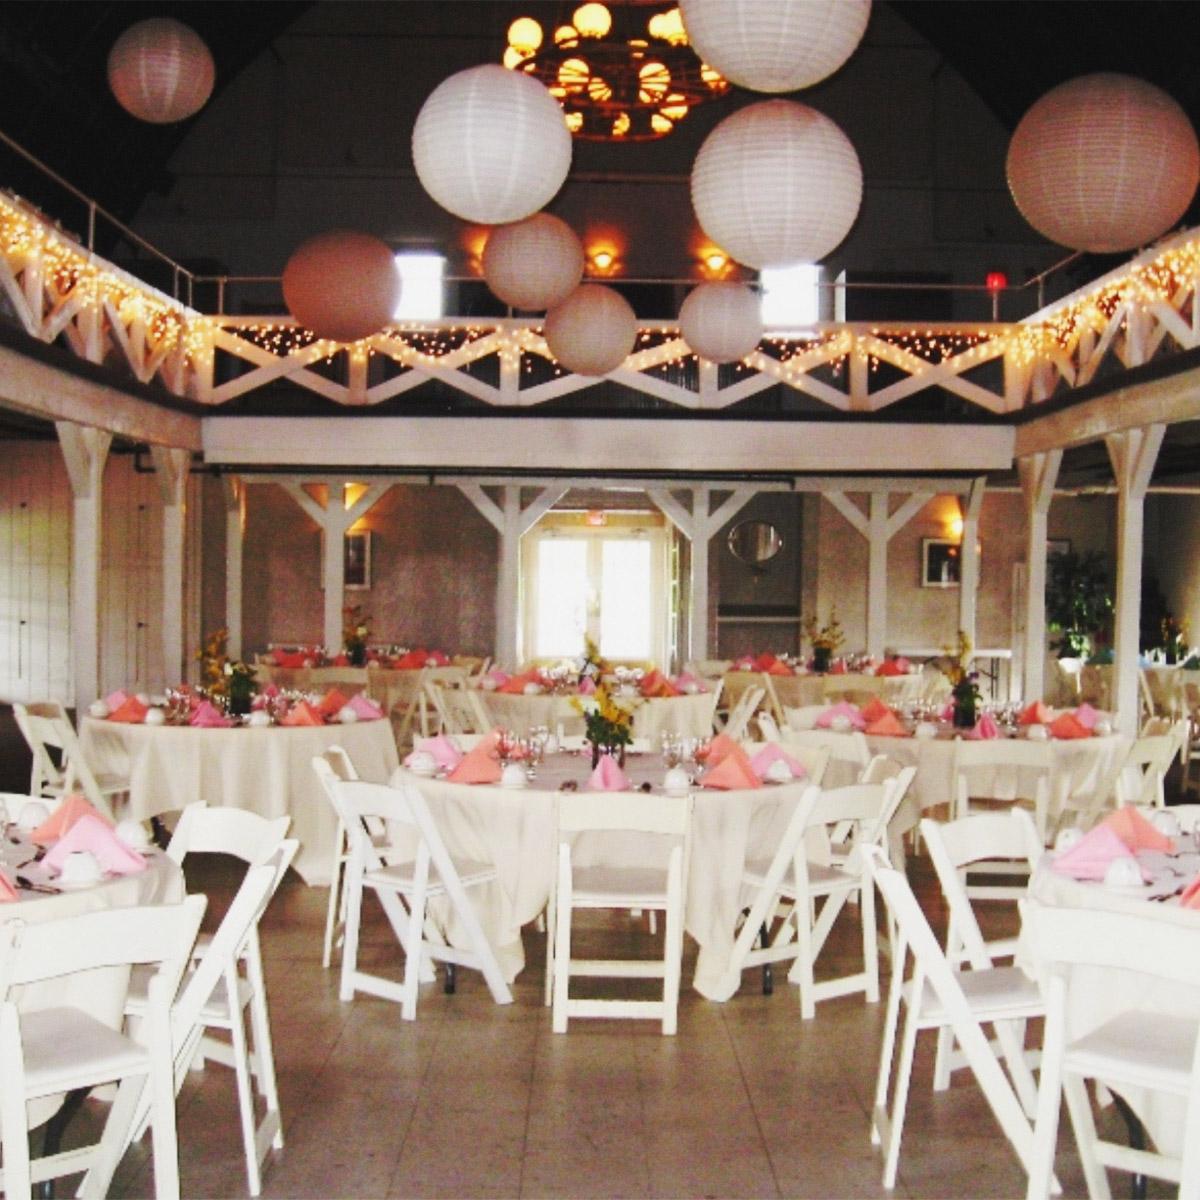 Lake Wedding Ideas: Small Wedding Blog